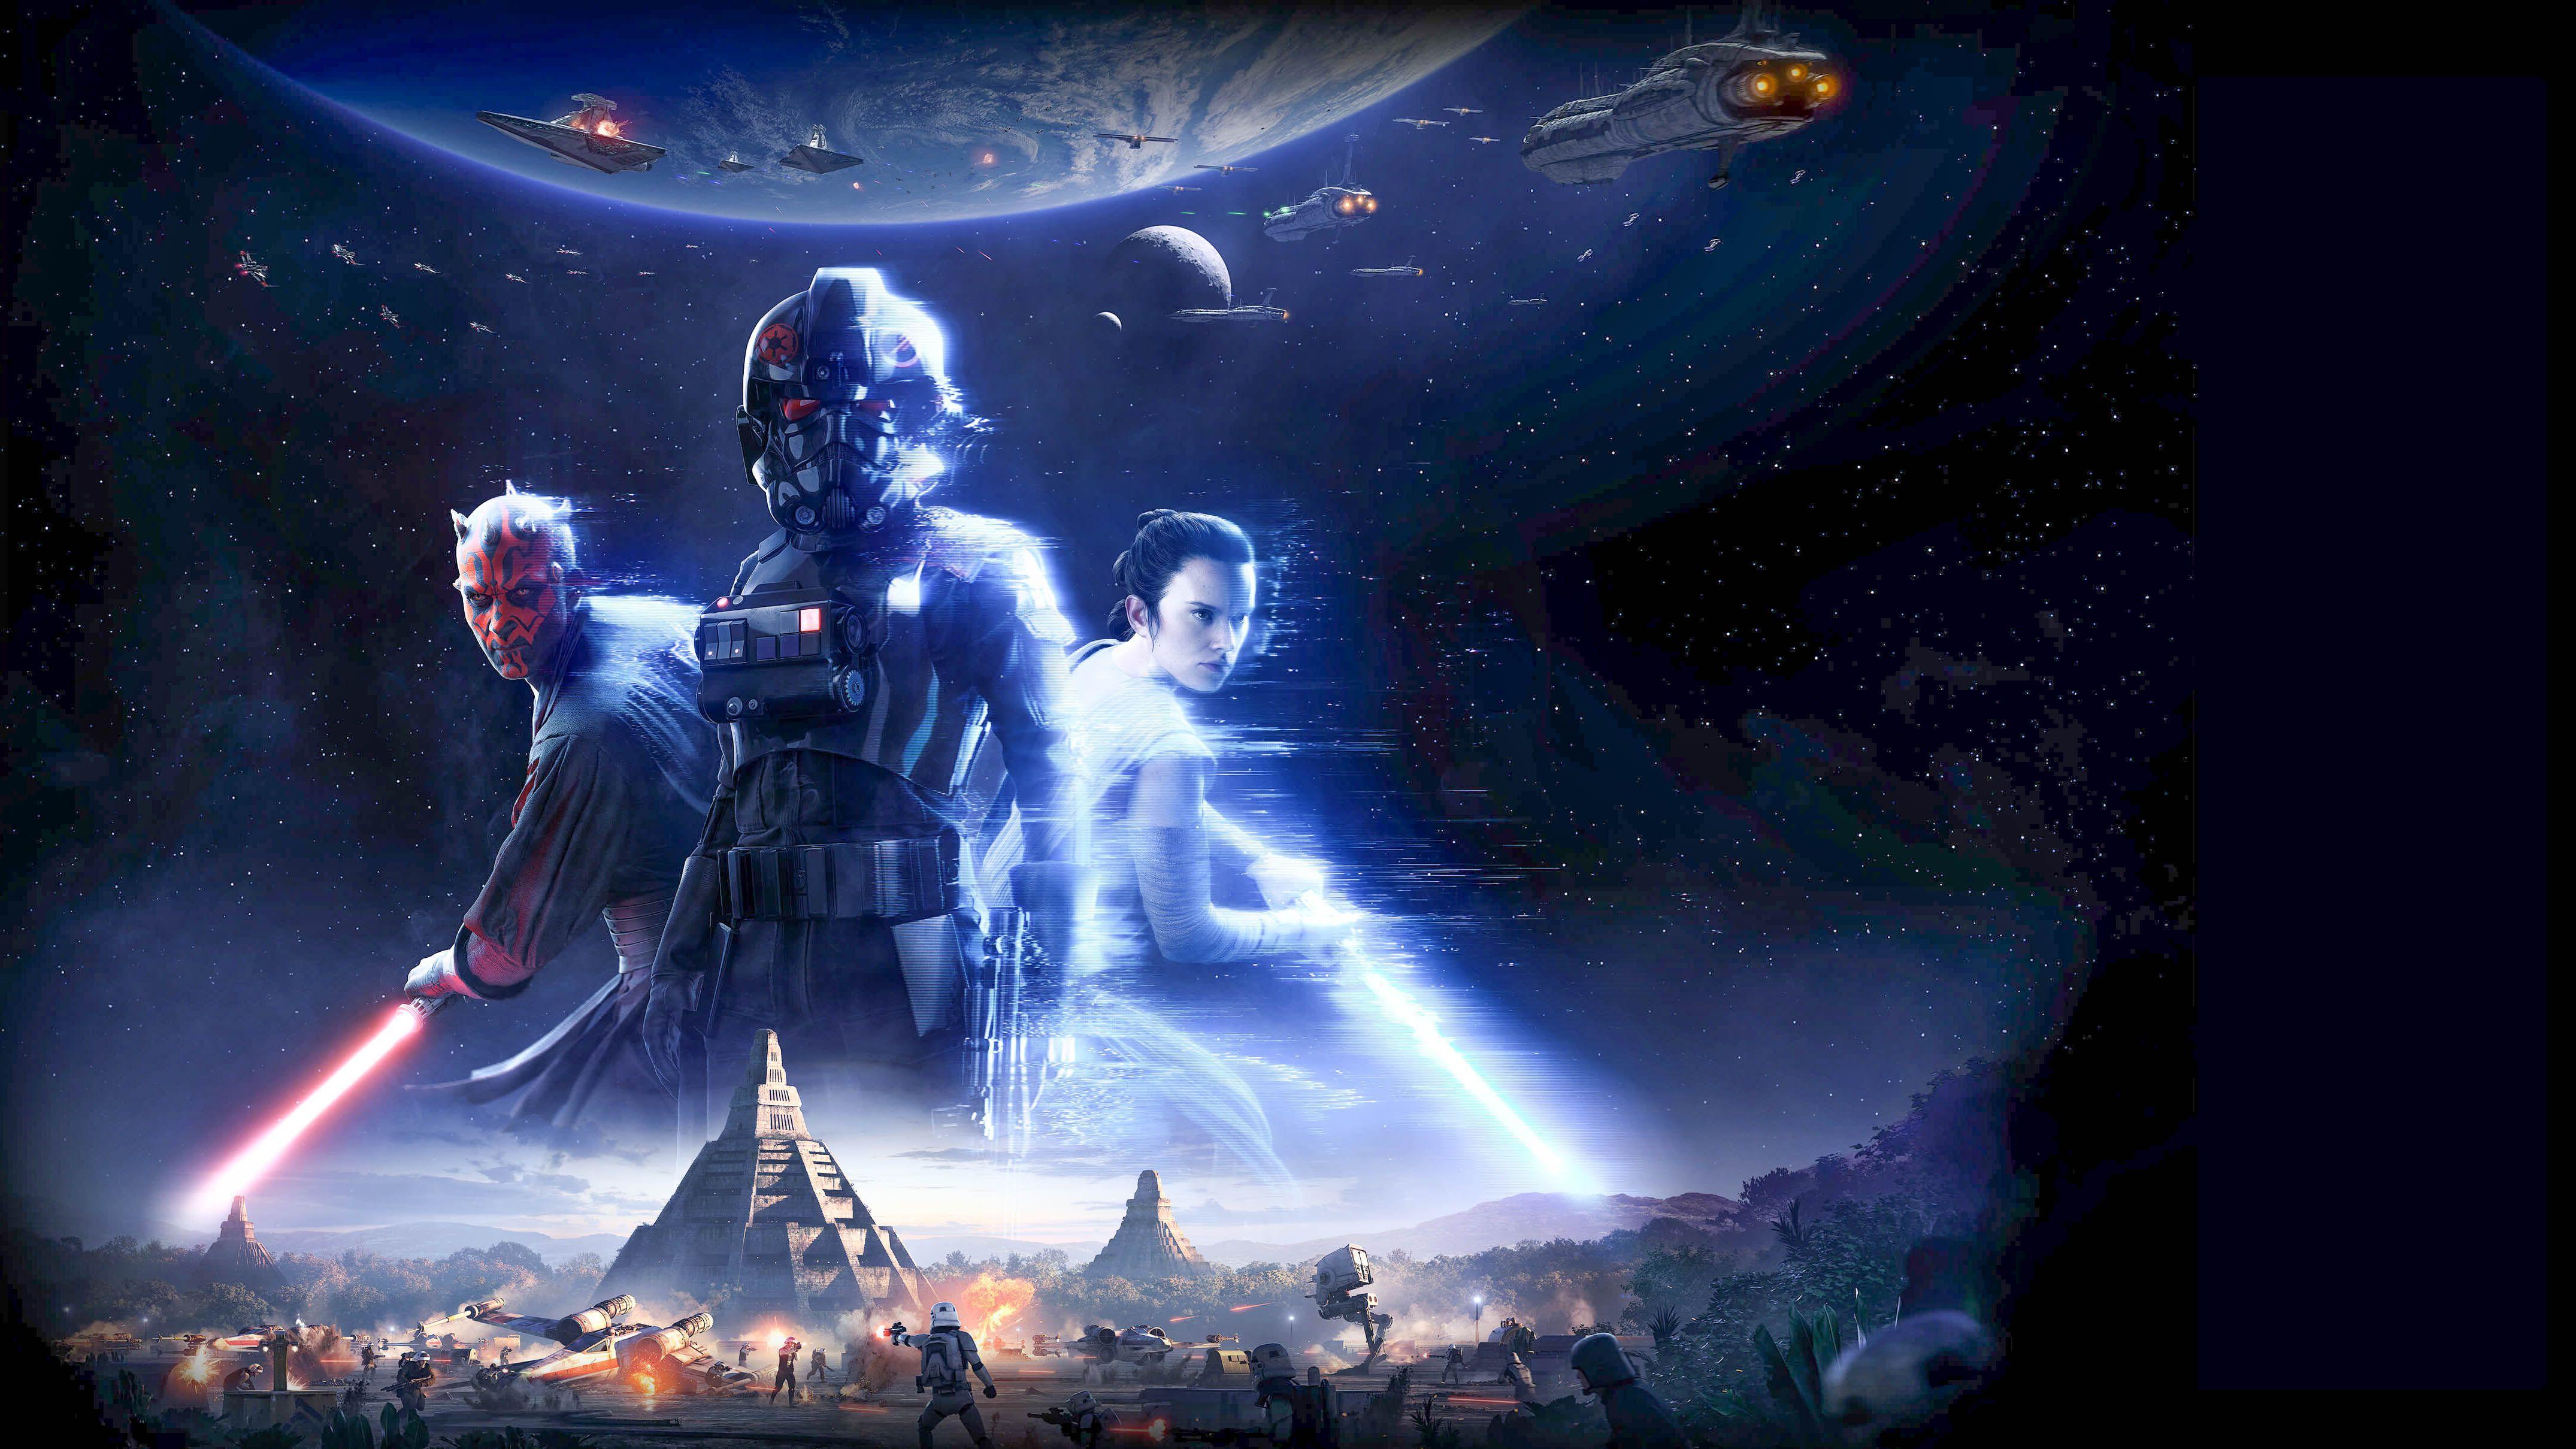 Star Wars Battlefront 2 Wallpapers Top Free Star Wars